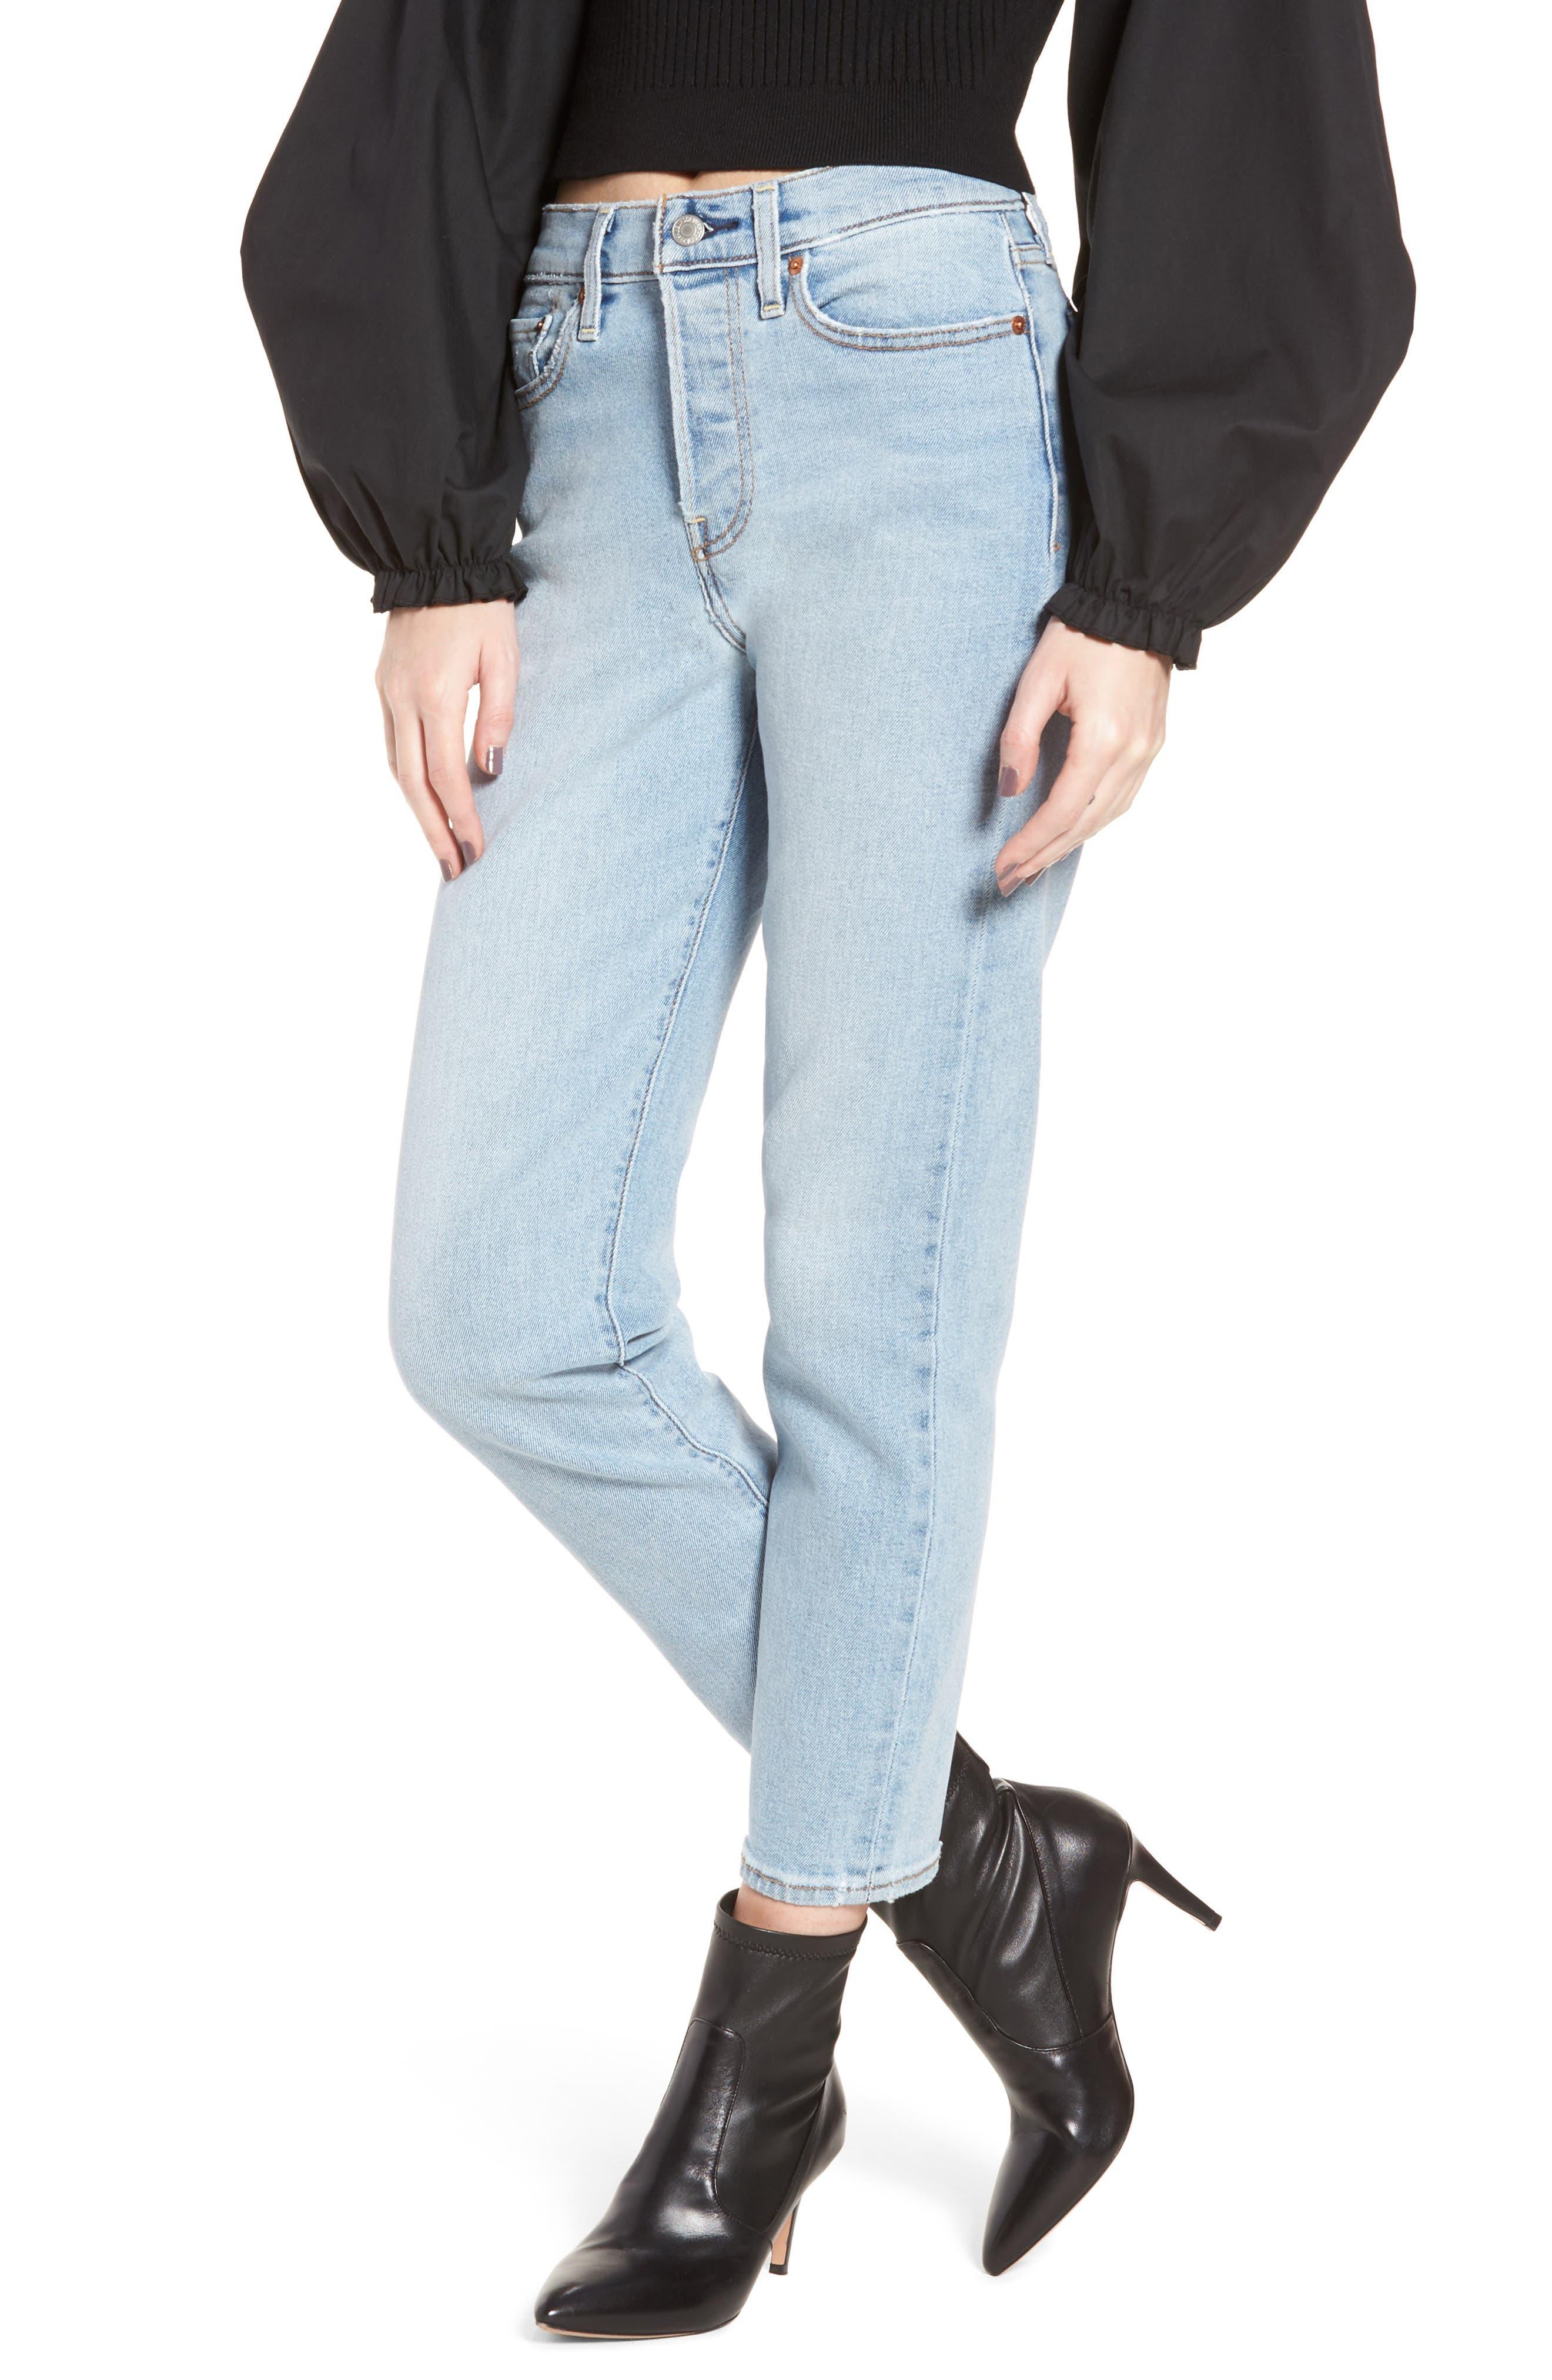 Wedgie Icon Fit High Waist Crop Jeans,                             Main thumbnail 1, color,                             Bauhaus Blues